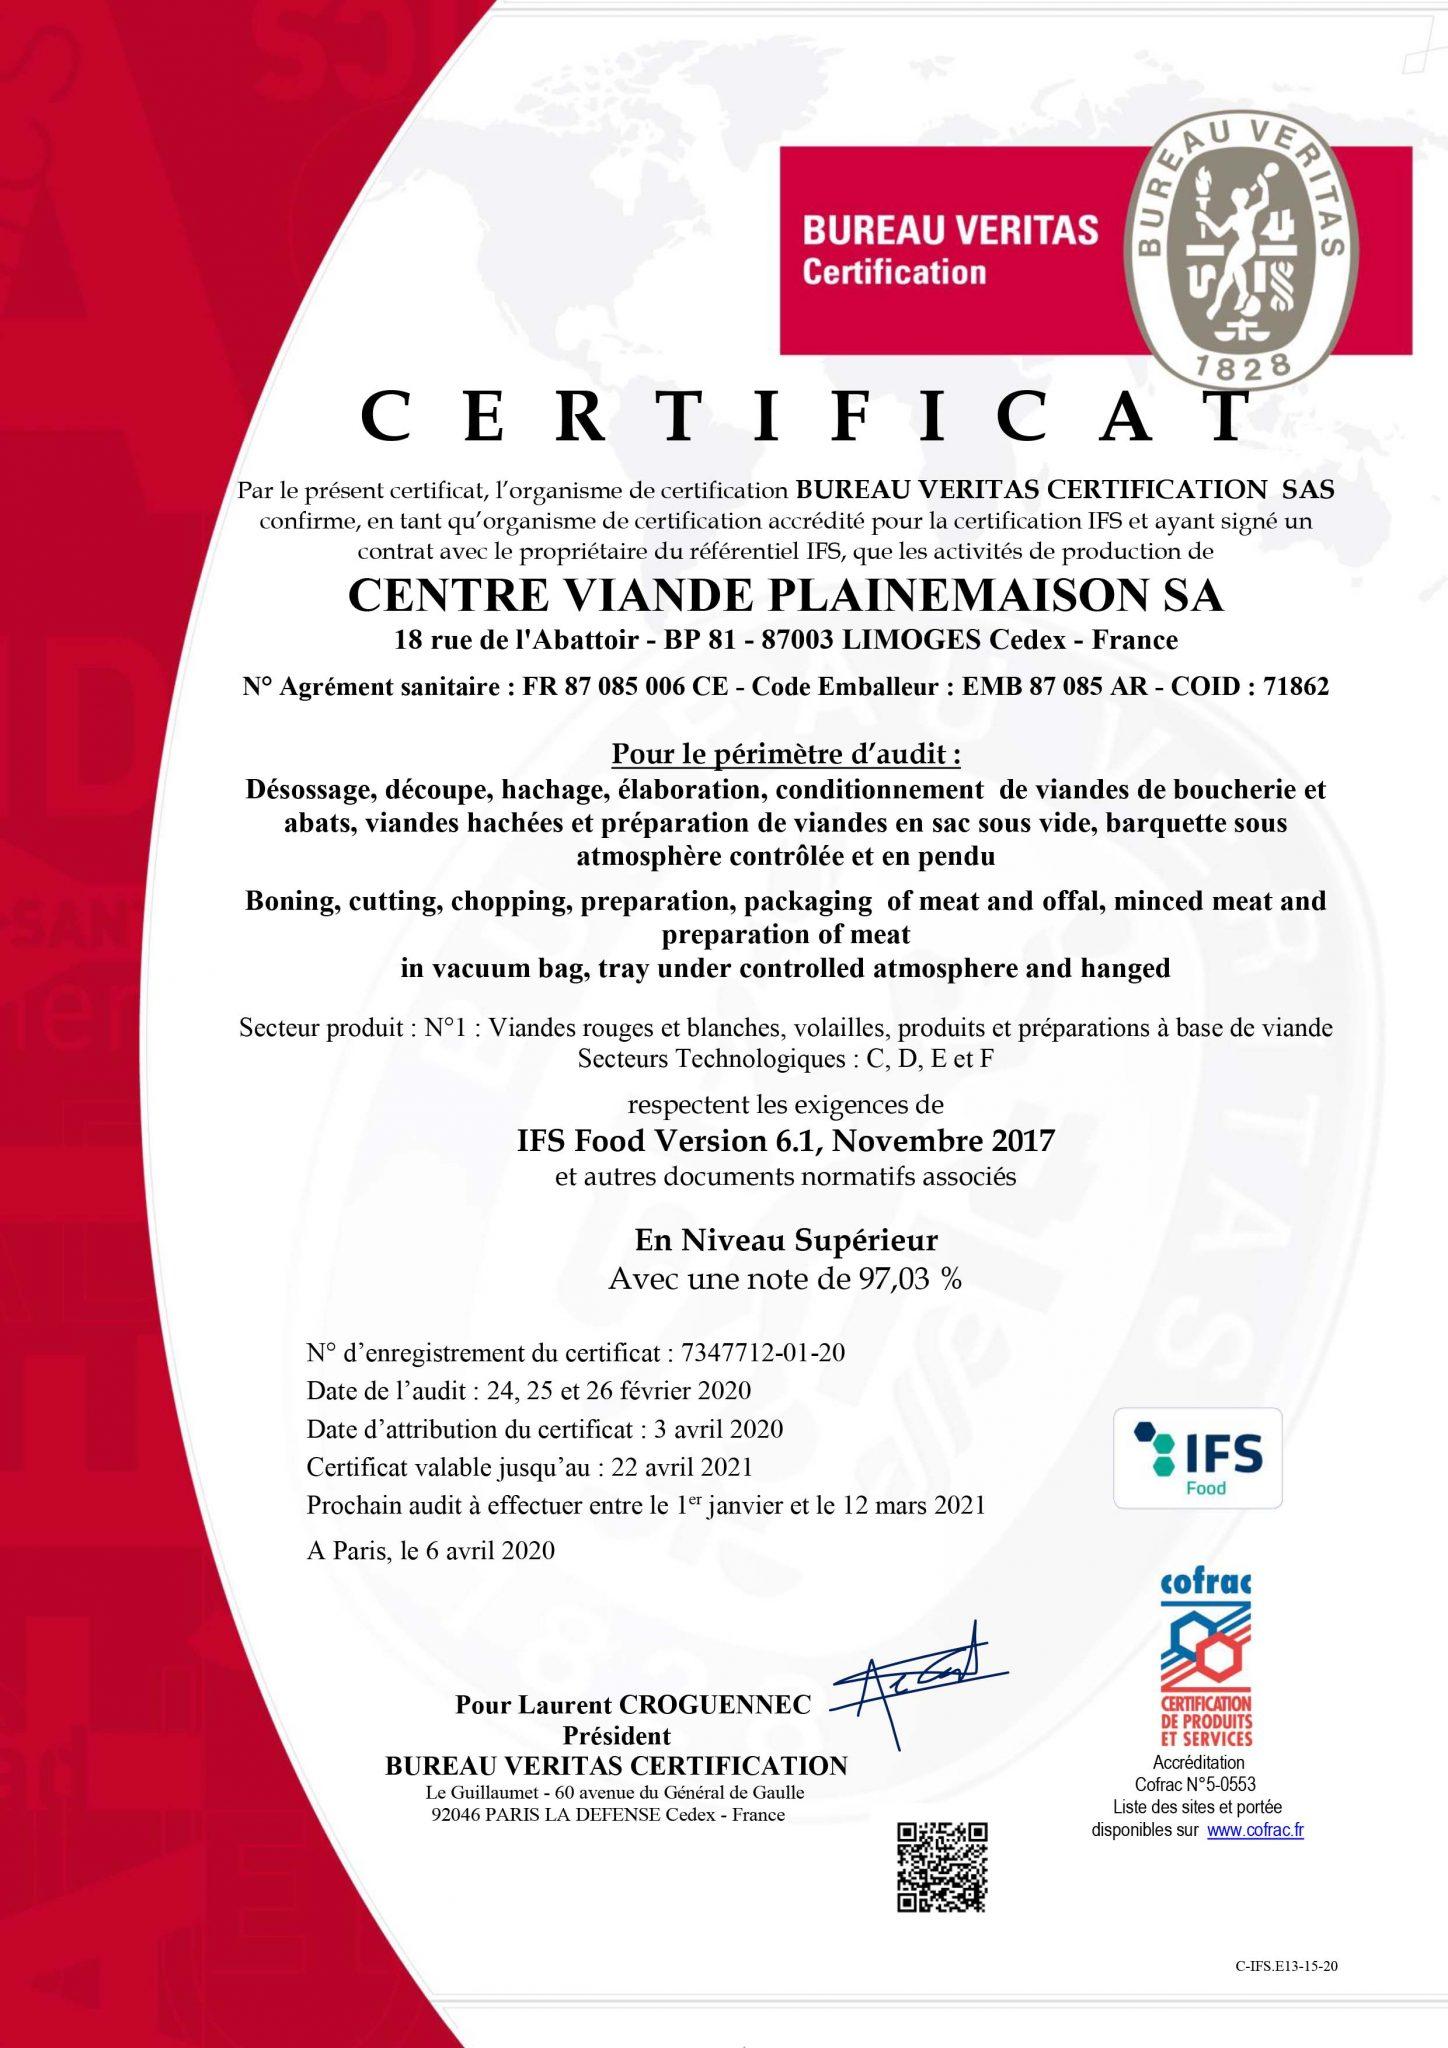 Nueva certificación IFS para CV Plainemaison